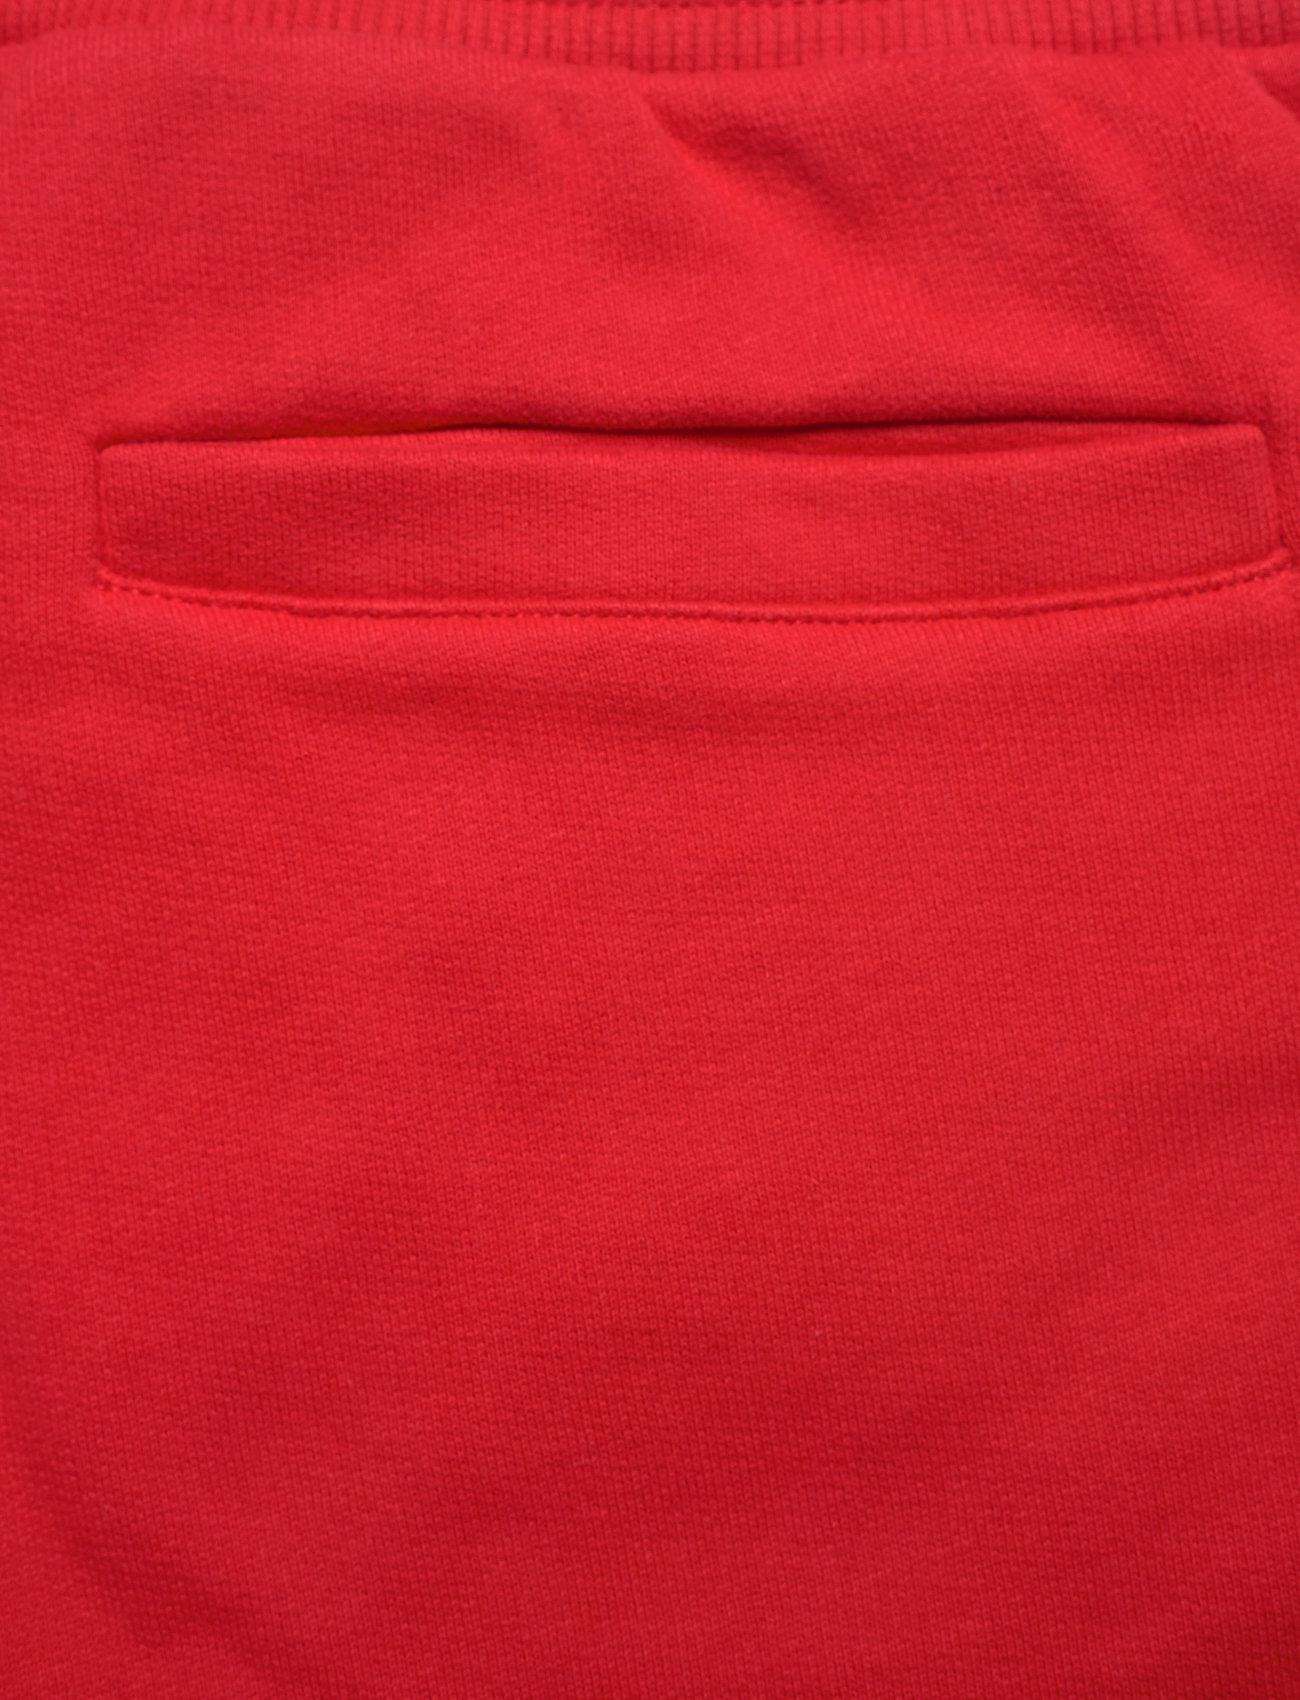 Calvin Klein Jeans - MONOGRAM JOG PANT - odzież - racing red - 4